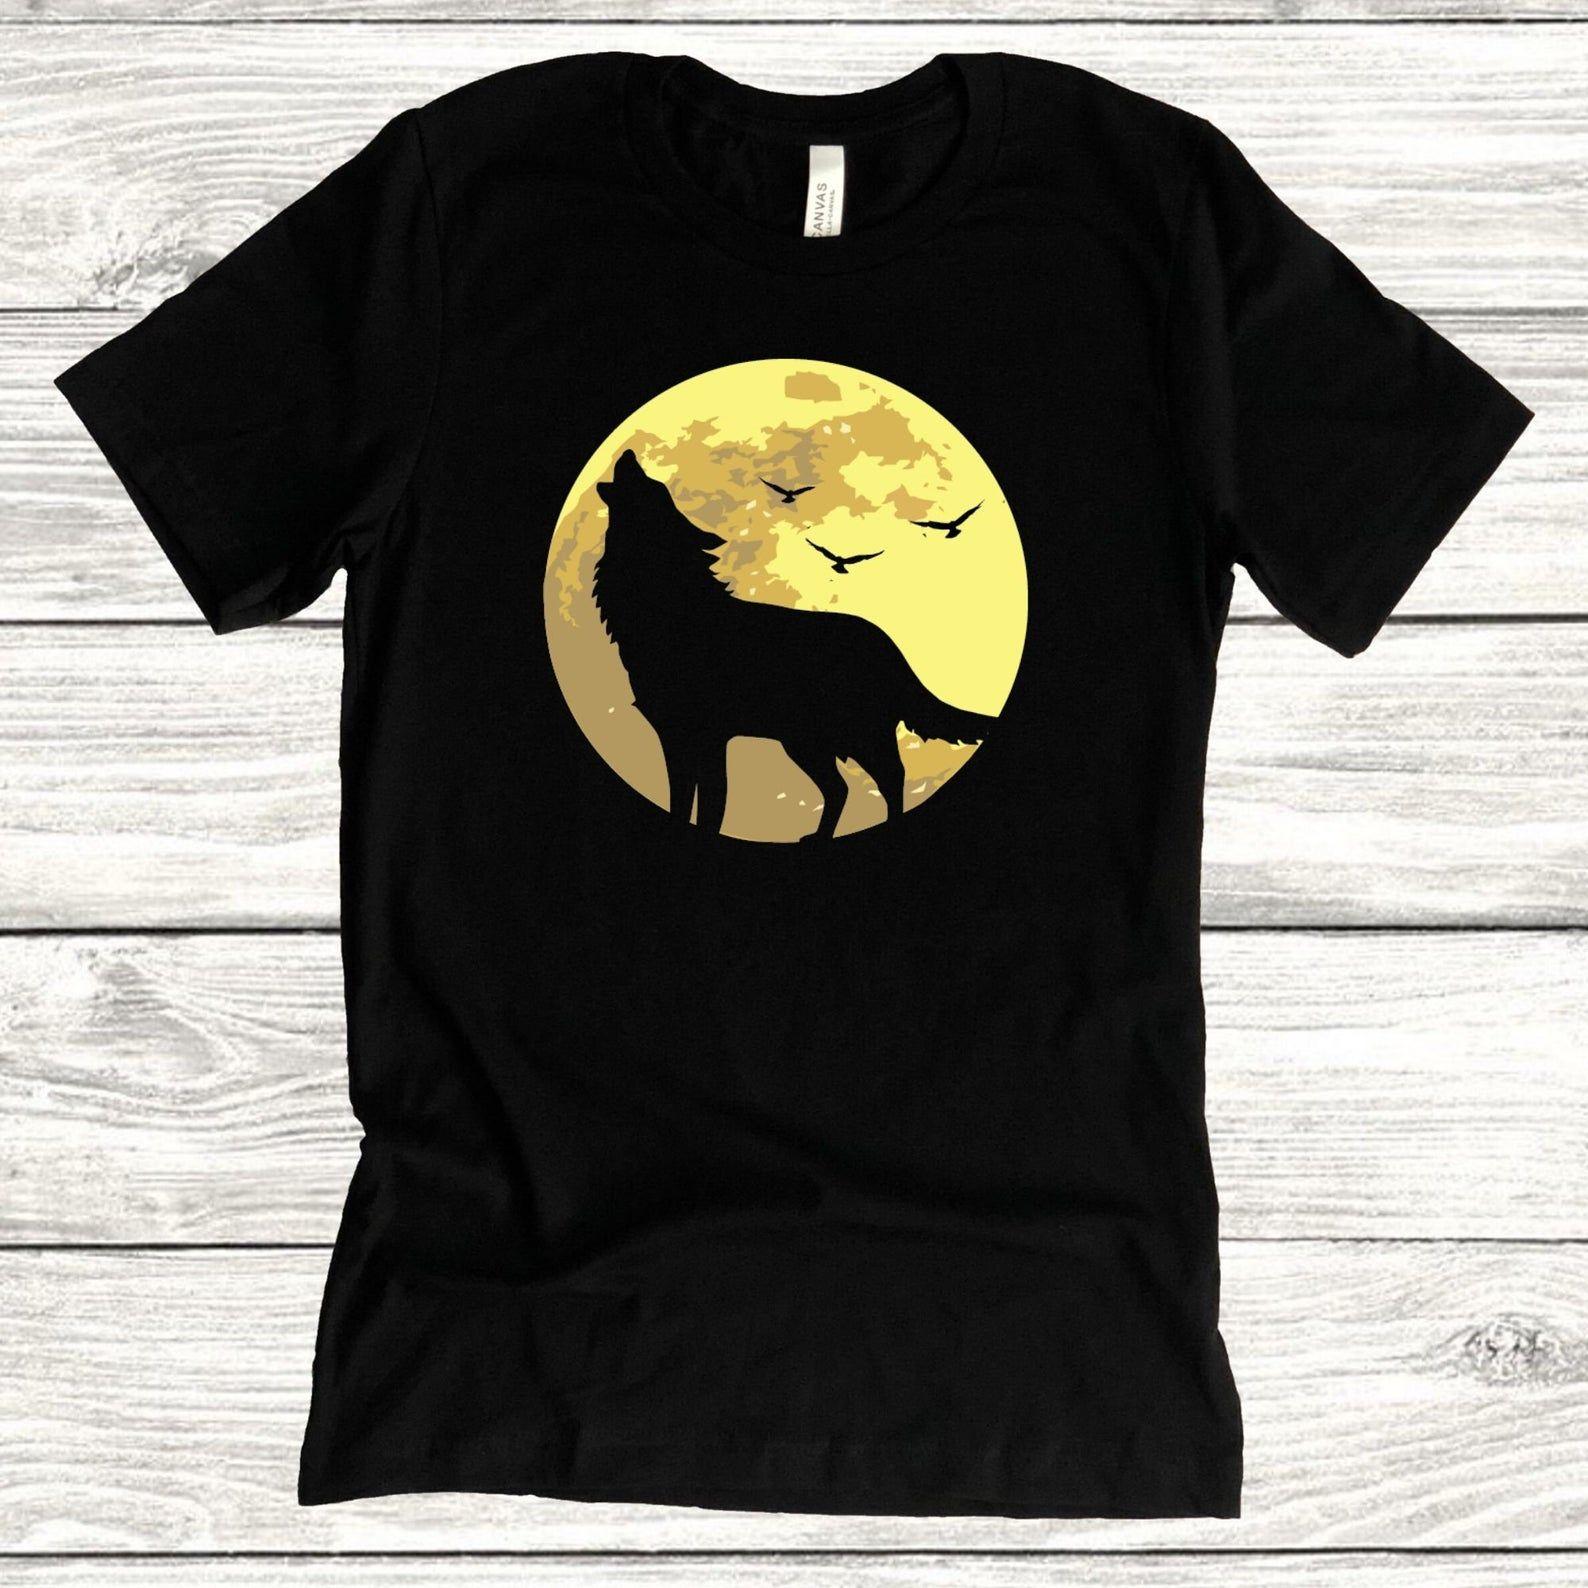 Wolf Howling In The Moon T Shirt Black Unisex Top Bella Etsy Black Shirt Animal Print Shirts Wolf T Shirt